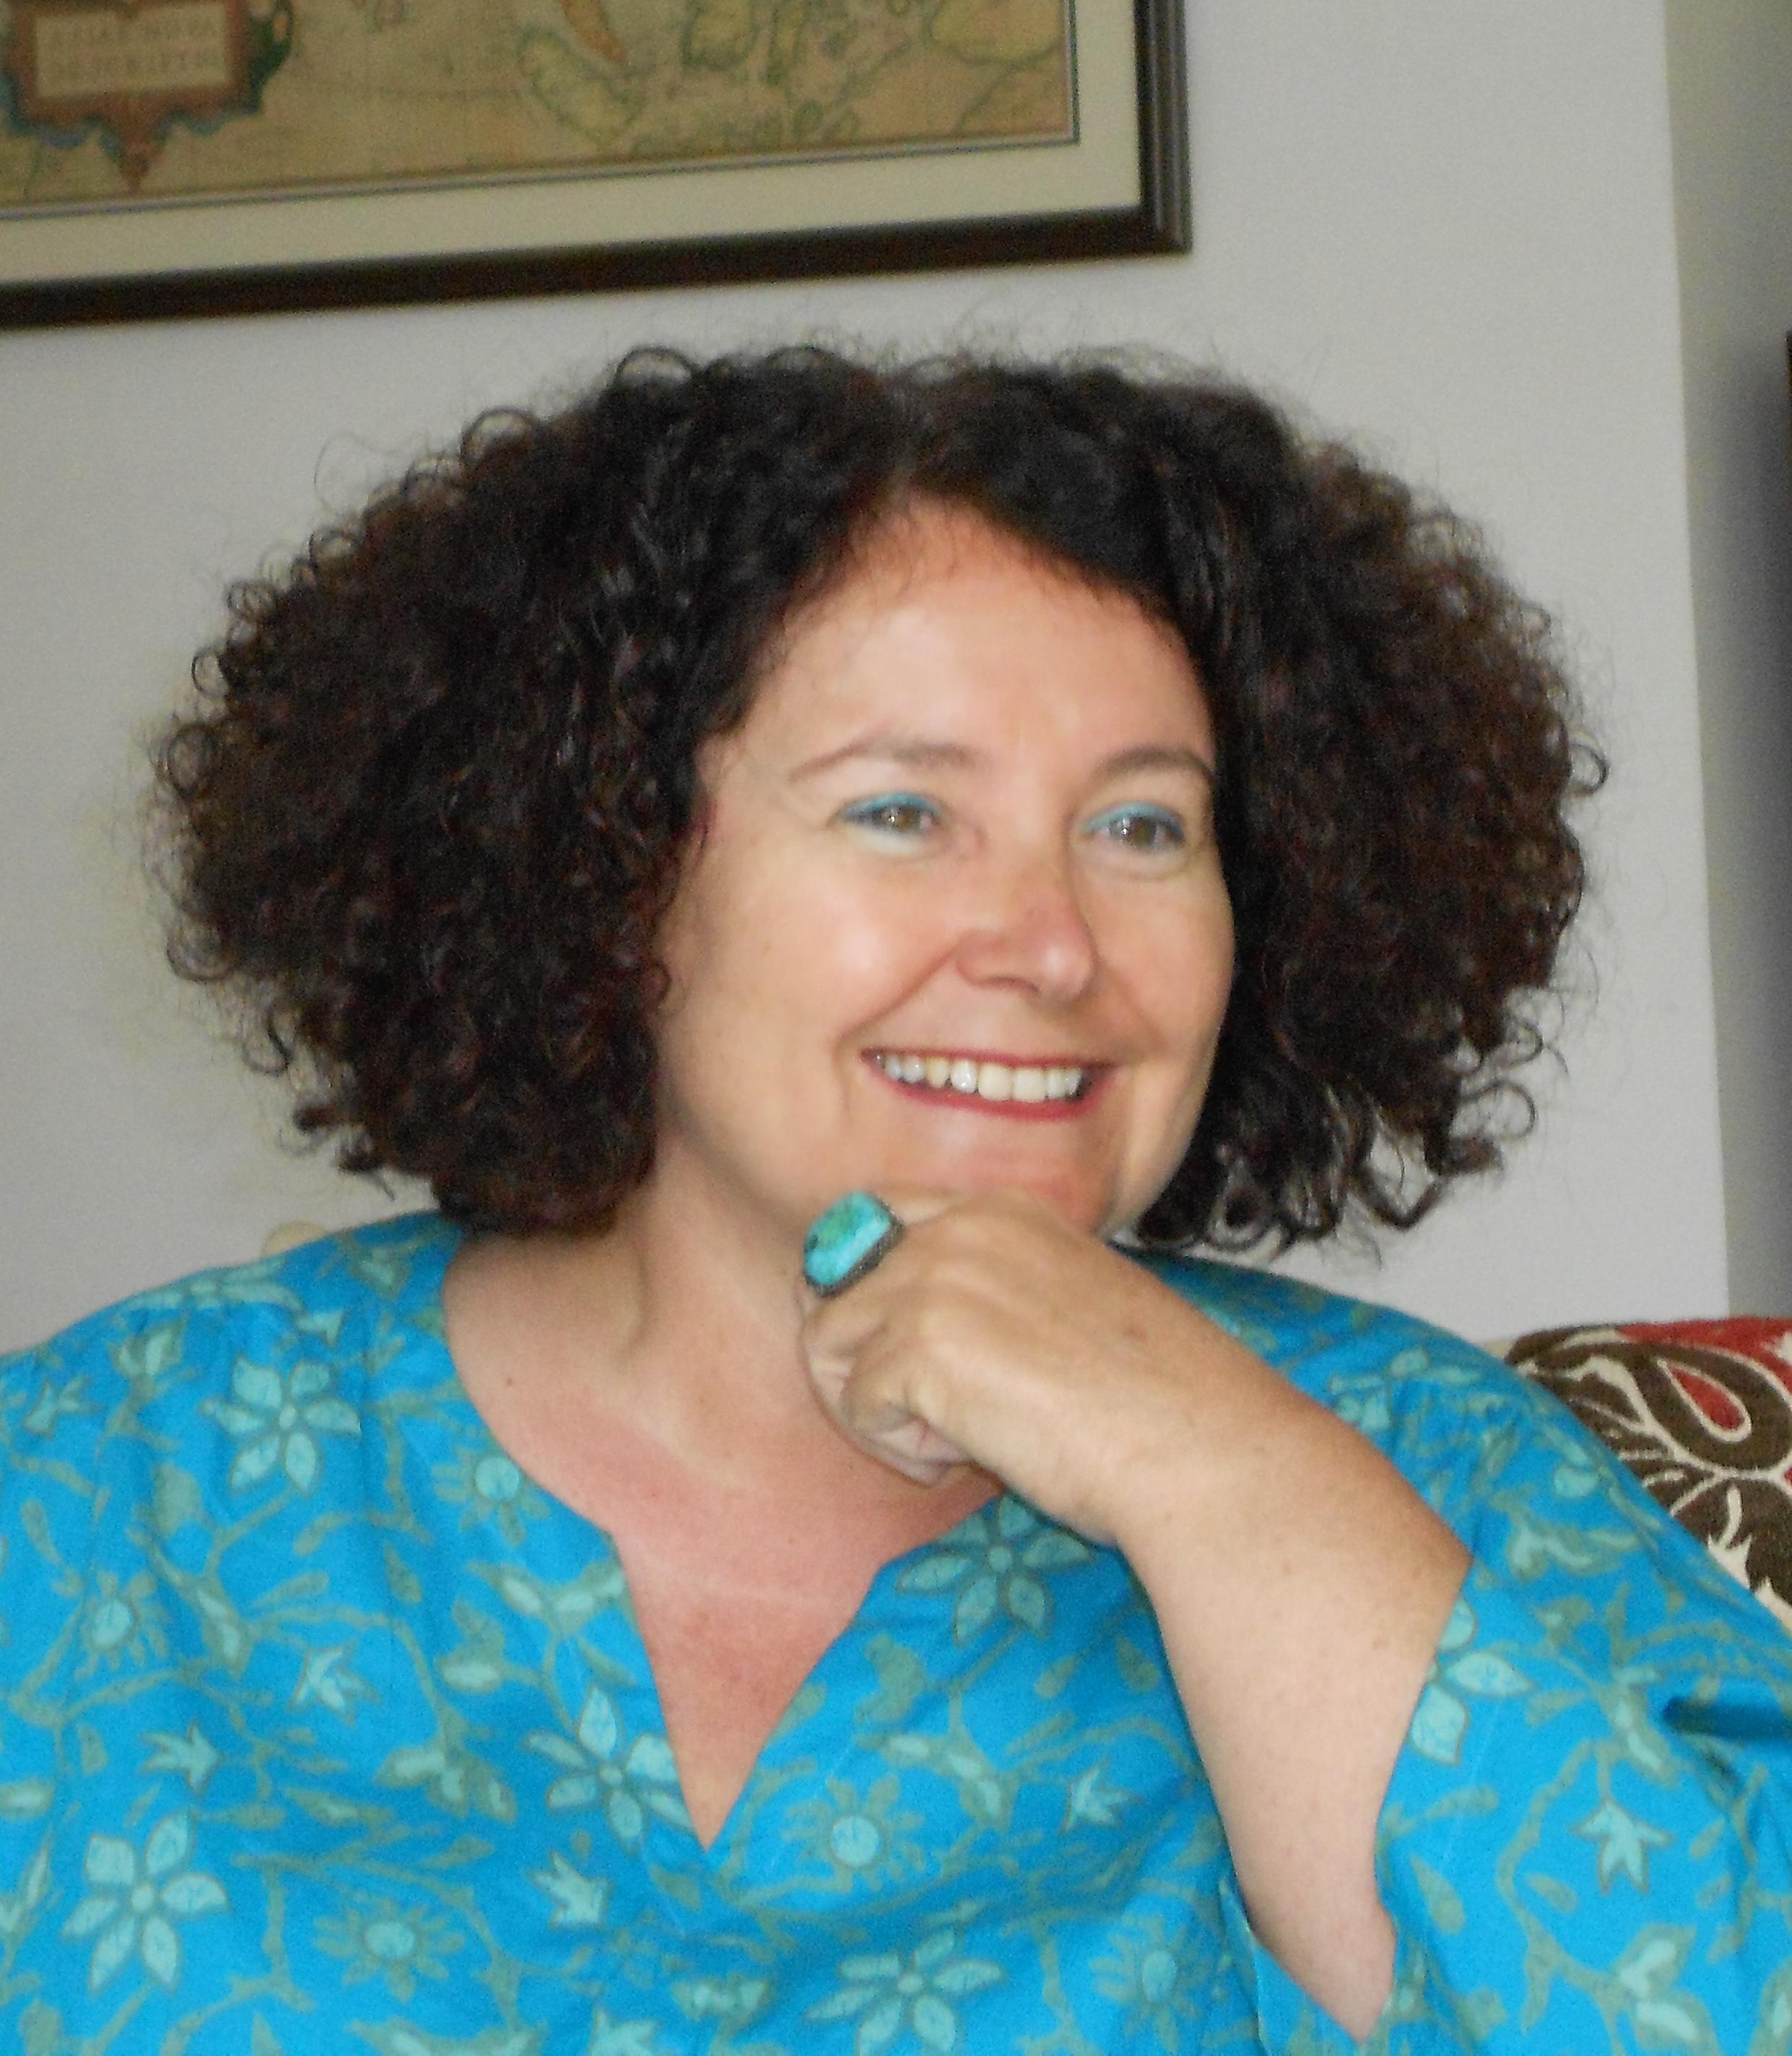 Catherine Legrand Sébille